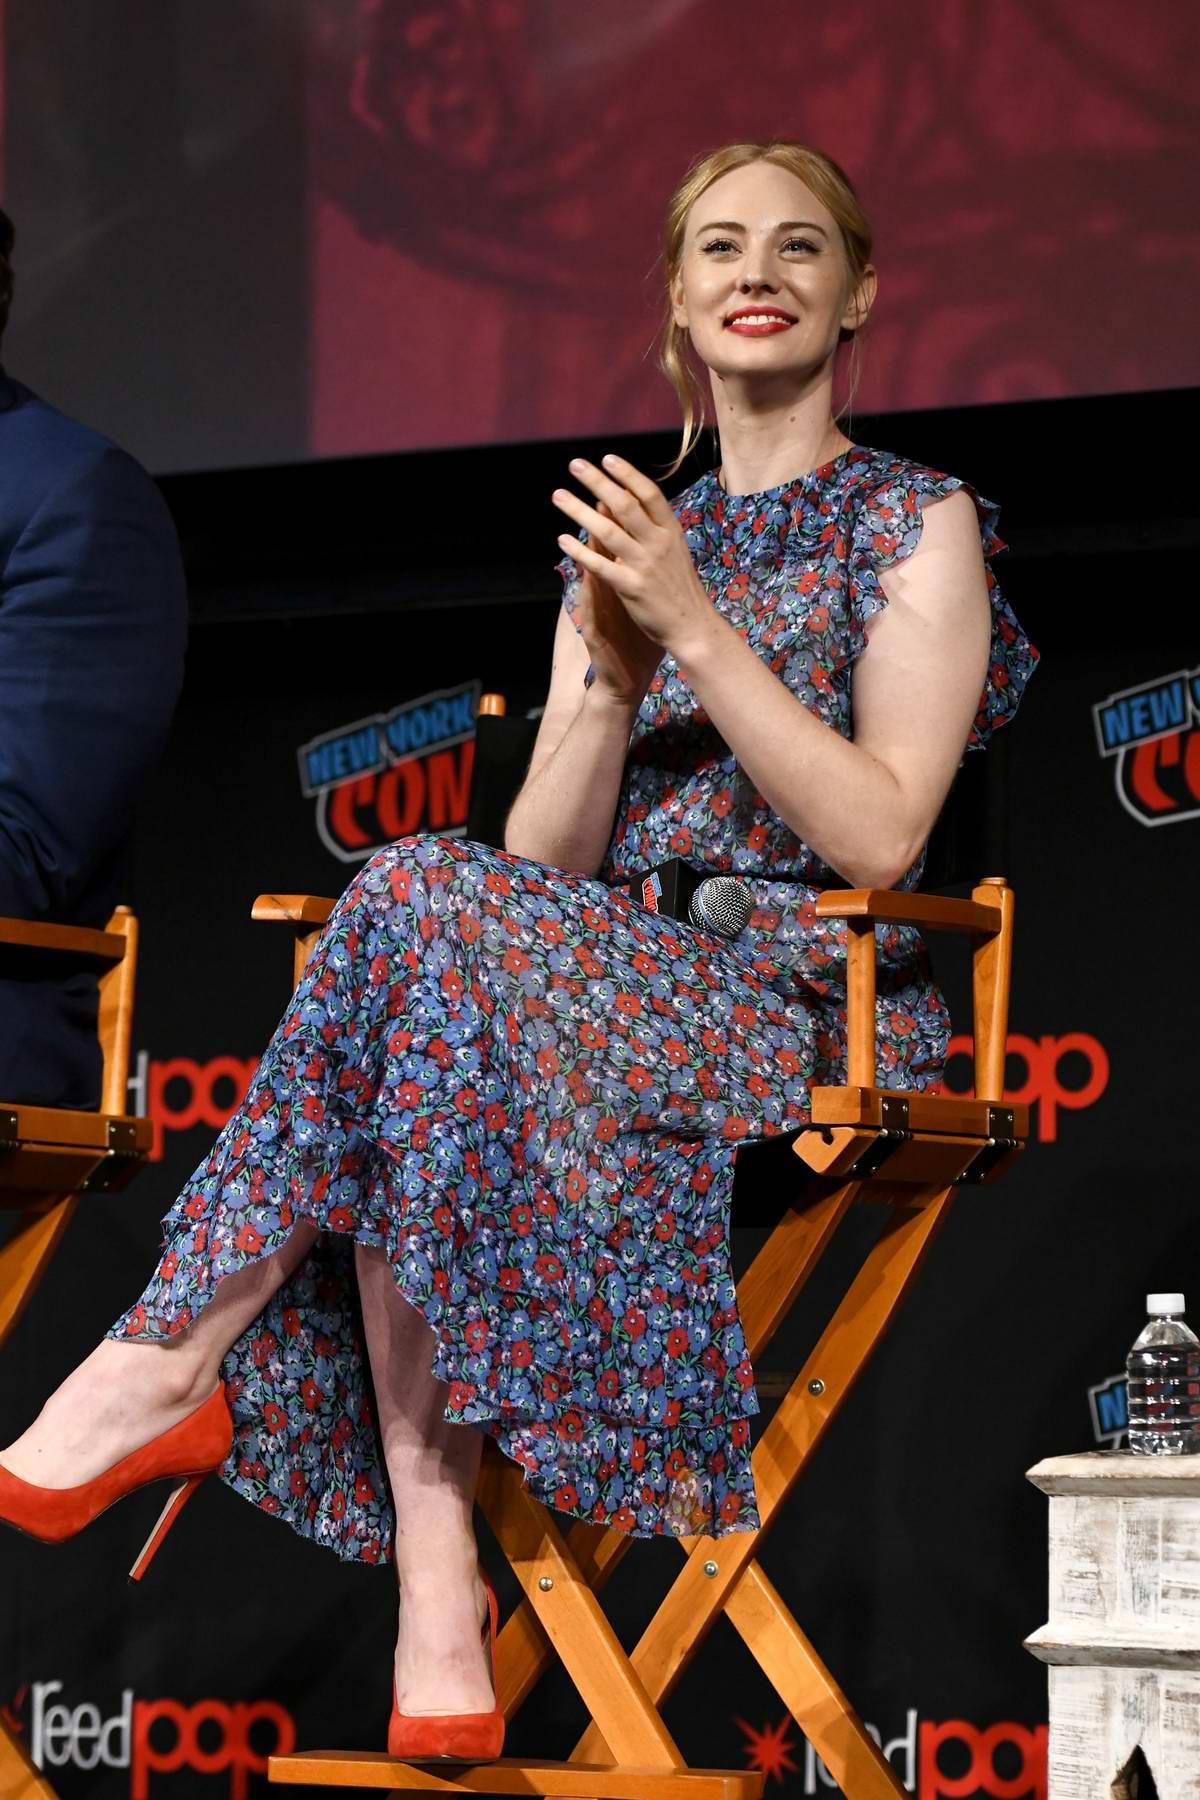 Deborah Ann Woll attends Marvel's Daredevil Season 3 Panel during New York Comic Con 2018 (NYCC 2018) in New York City